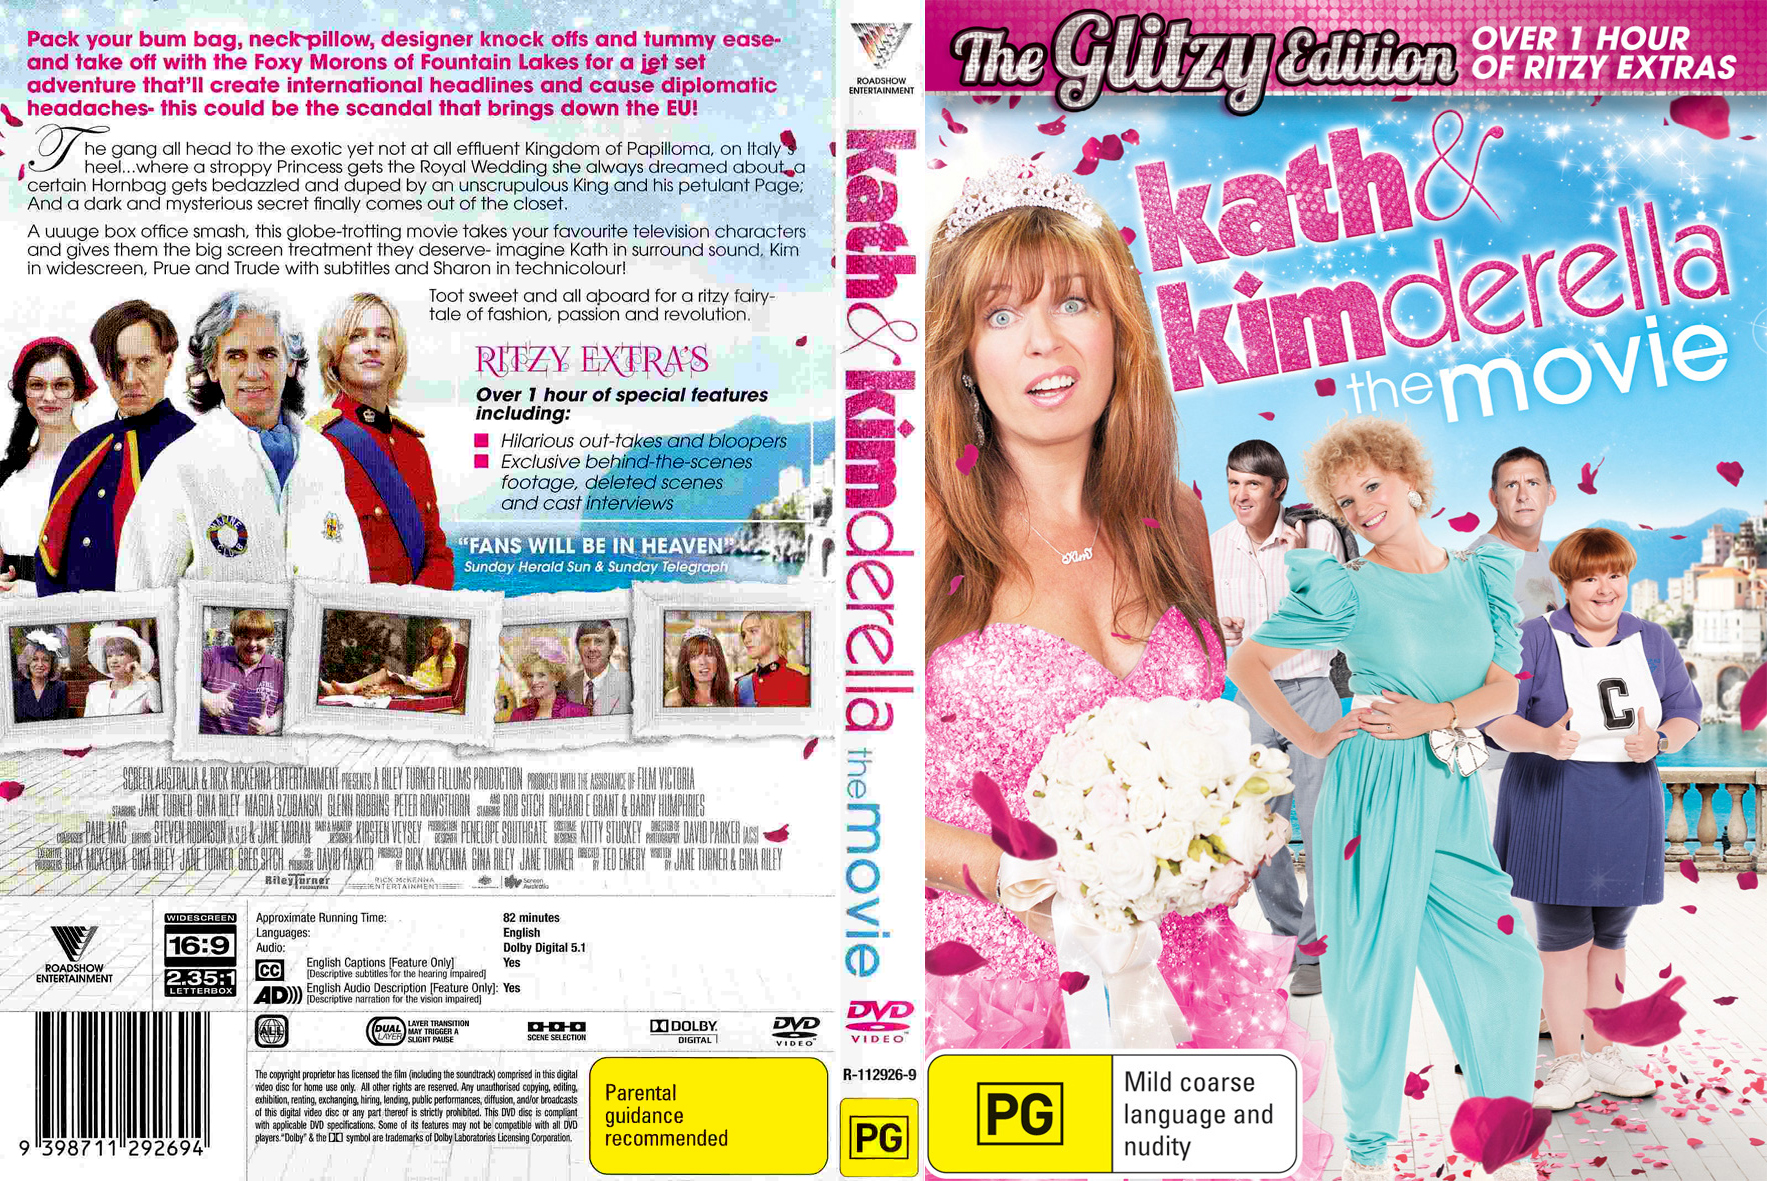 Kim at premiere kath & kimderella at village cinemas fountain gate.